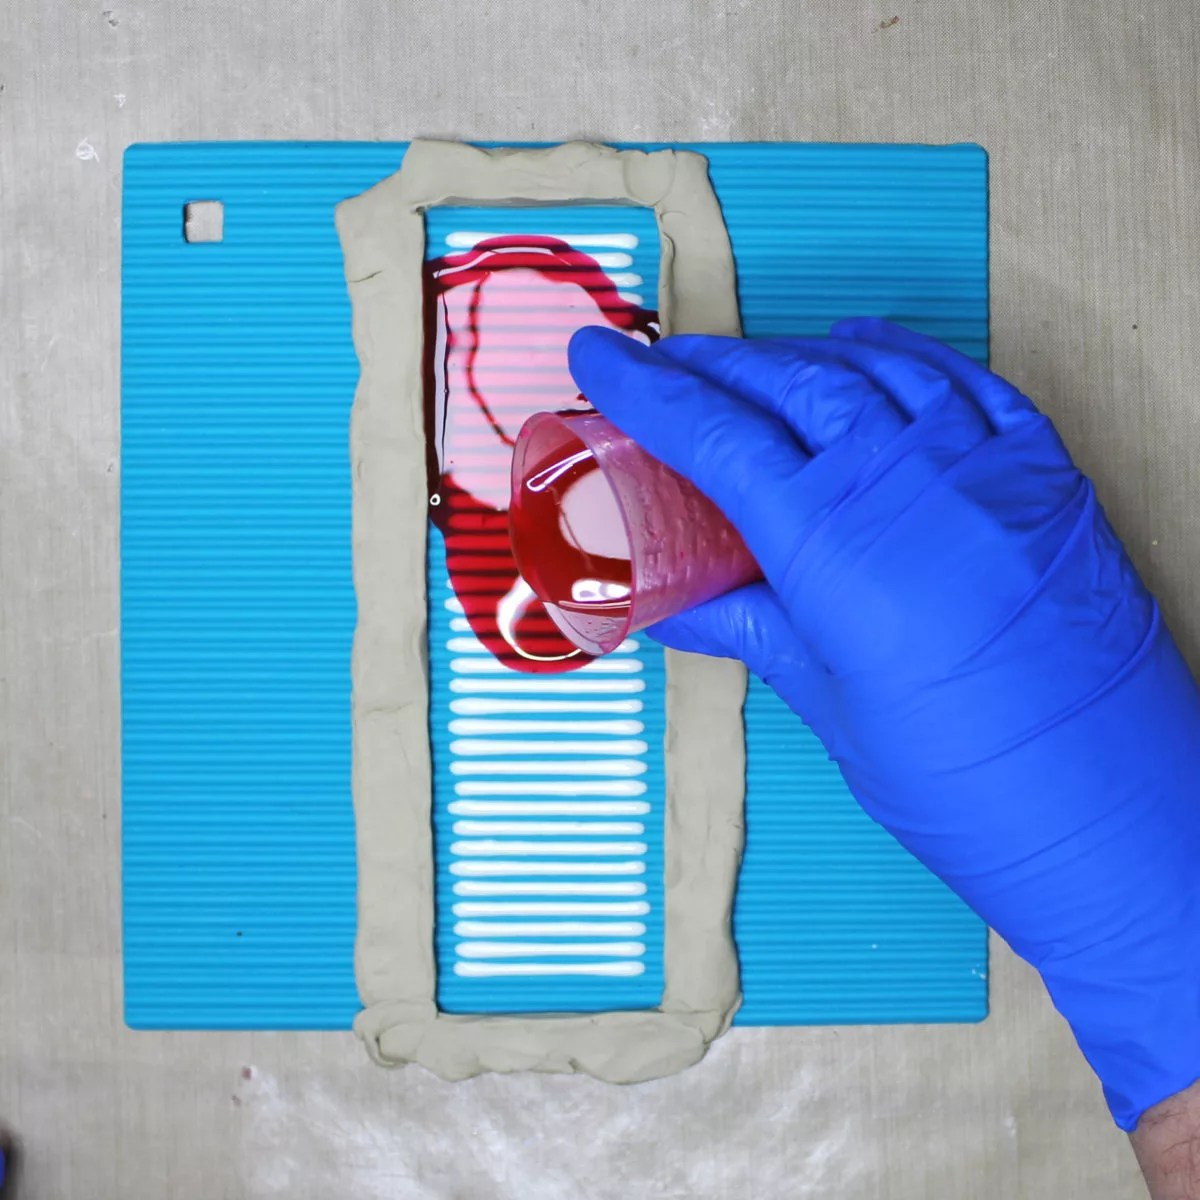 pouring resin onto a silicone mold